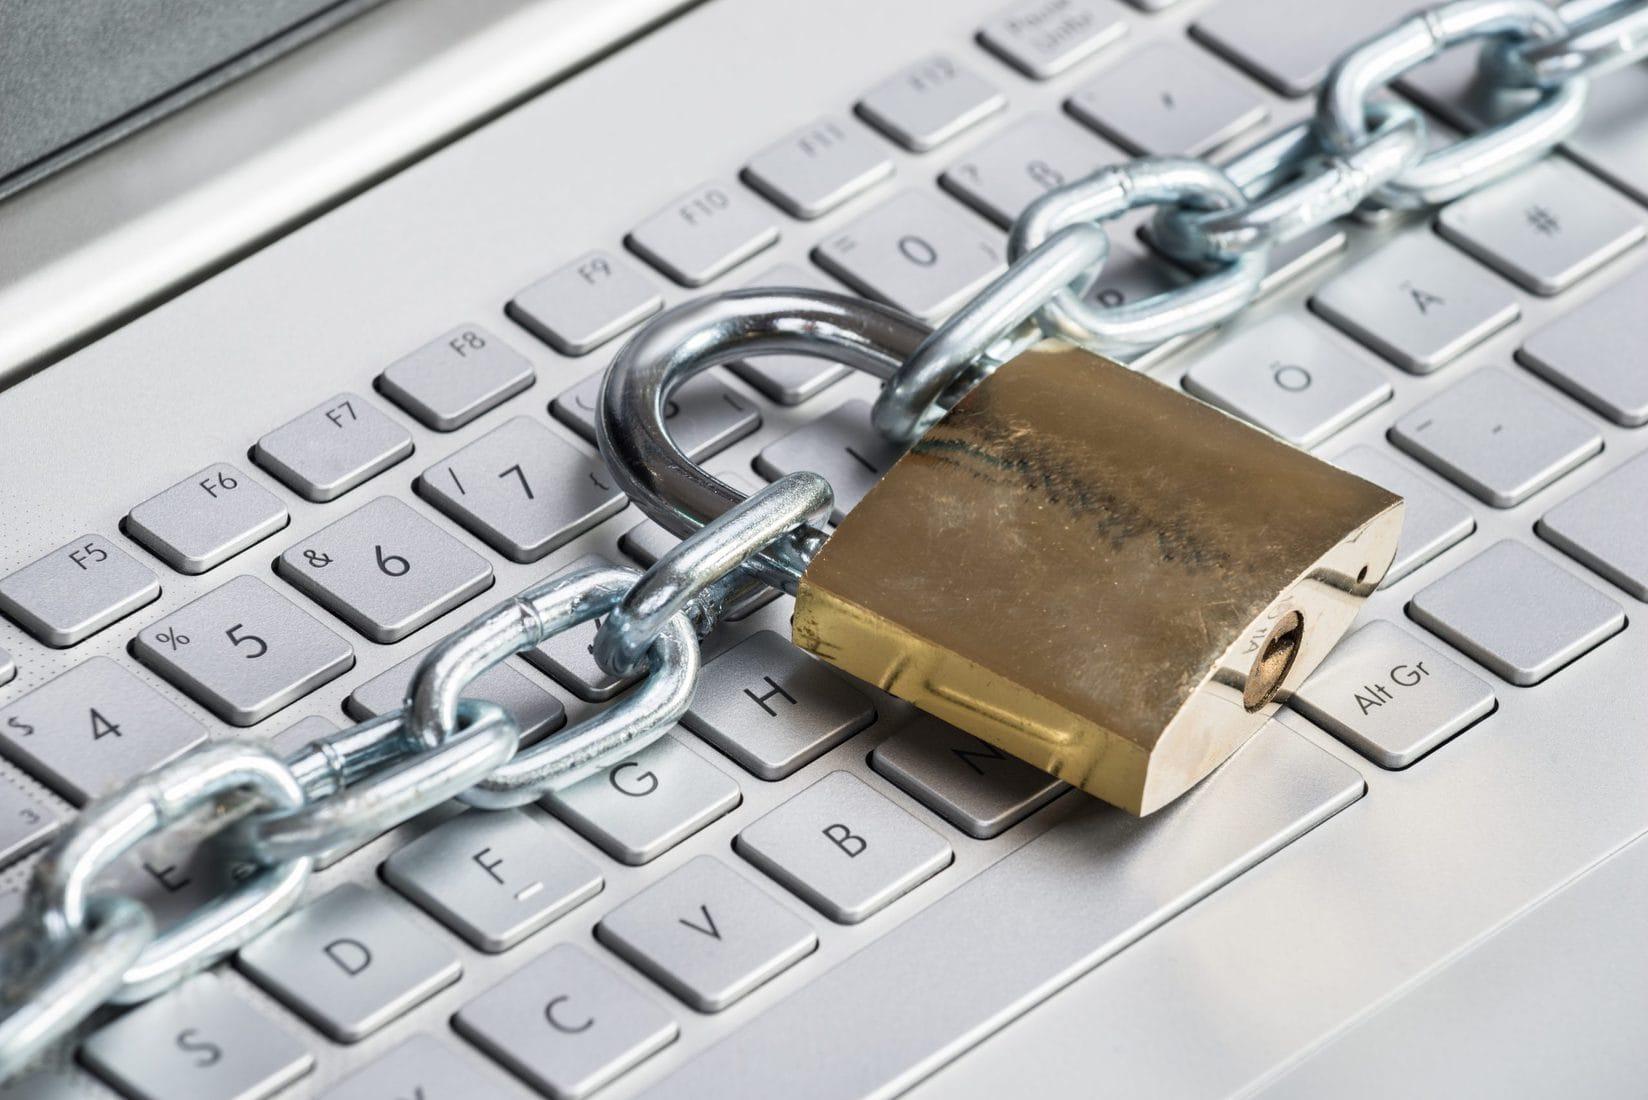 Lock on keyboard